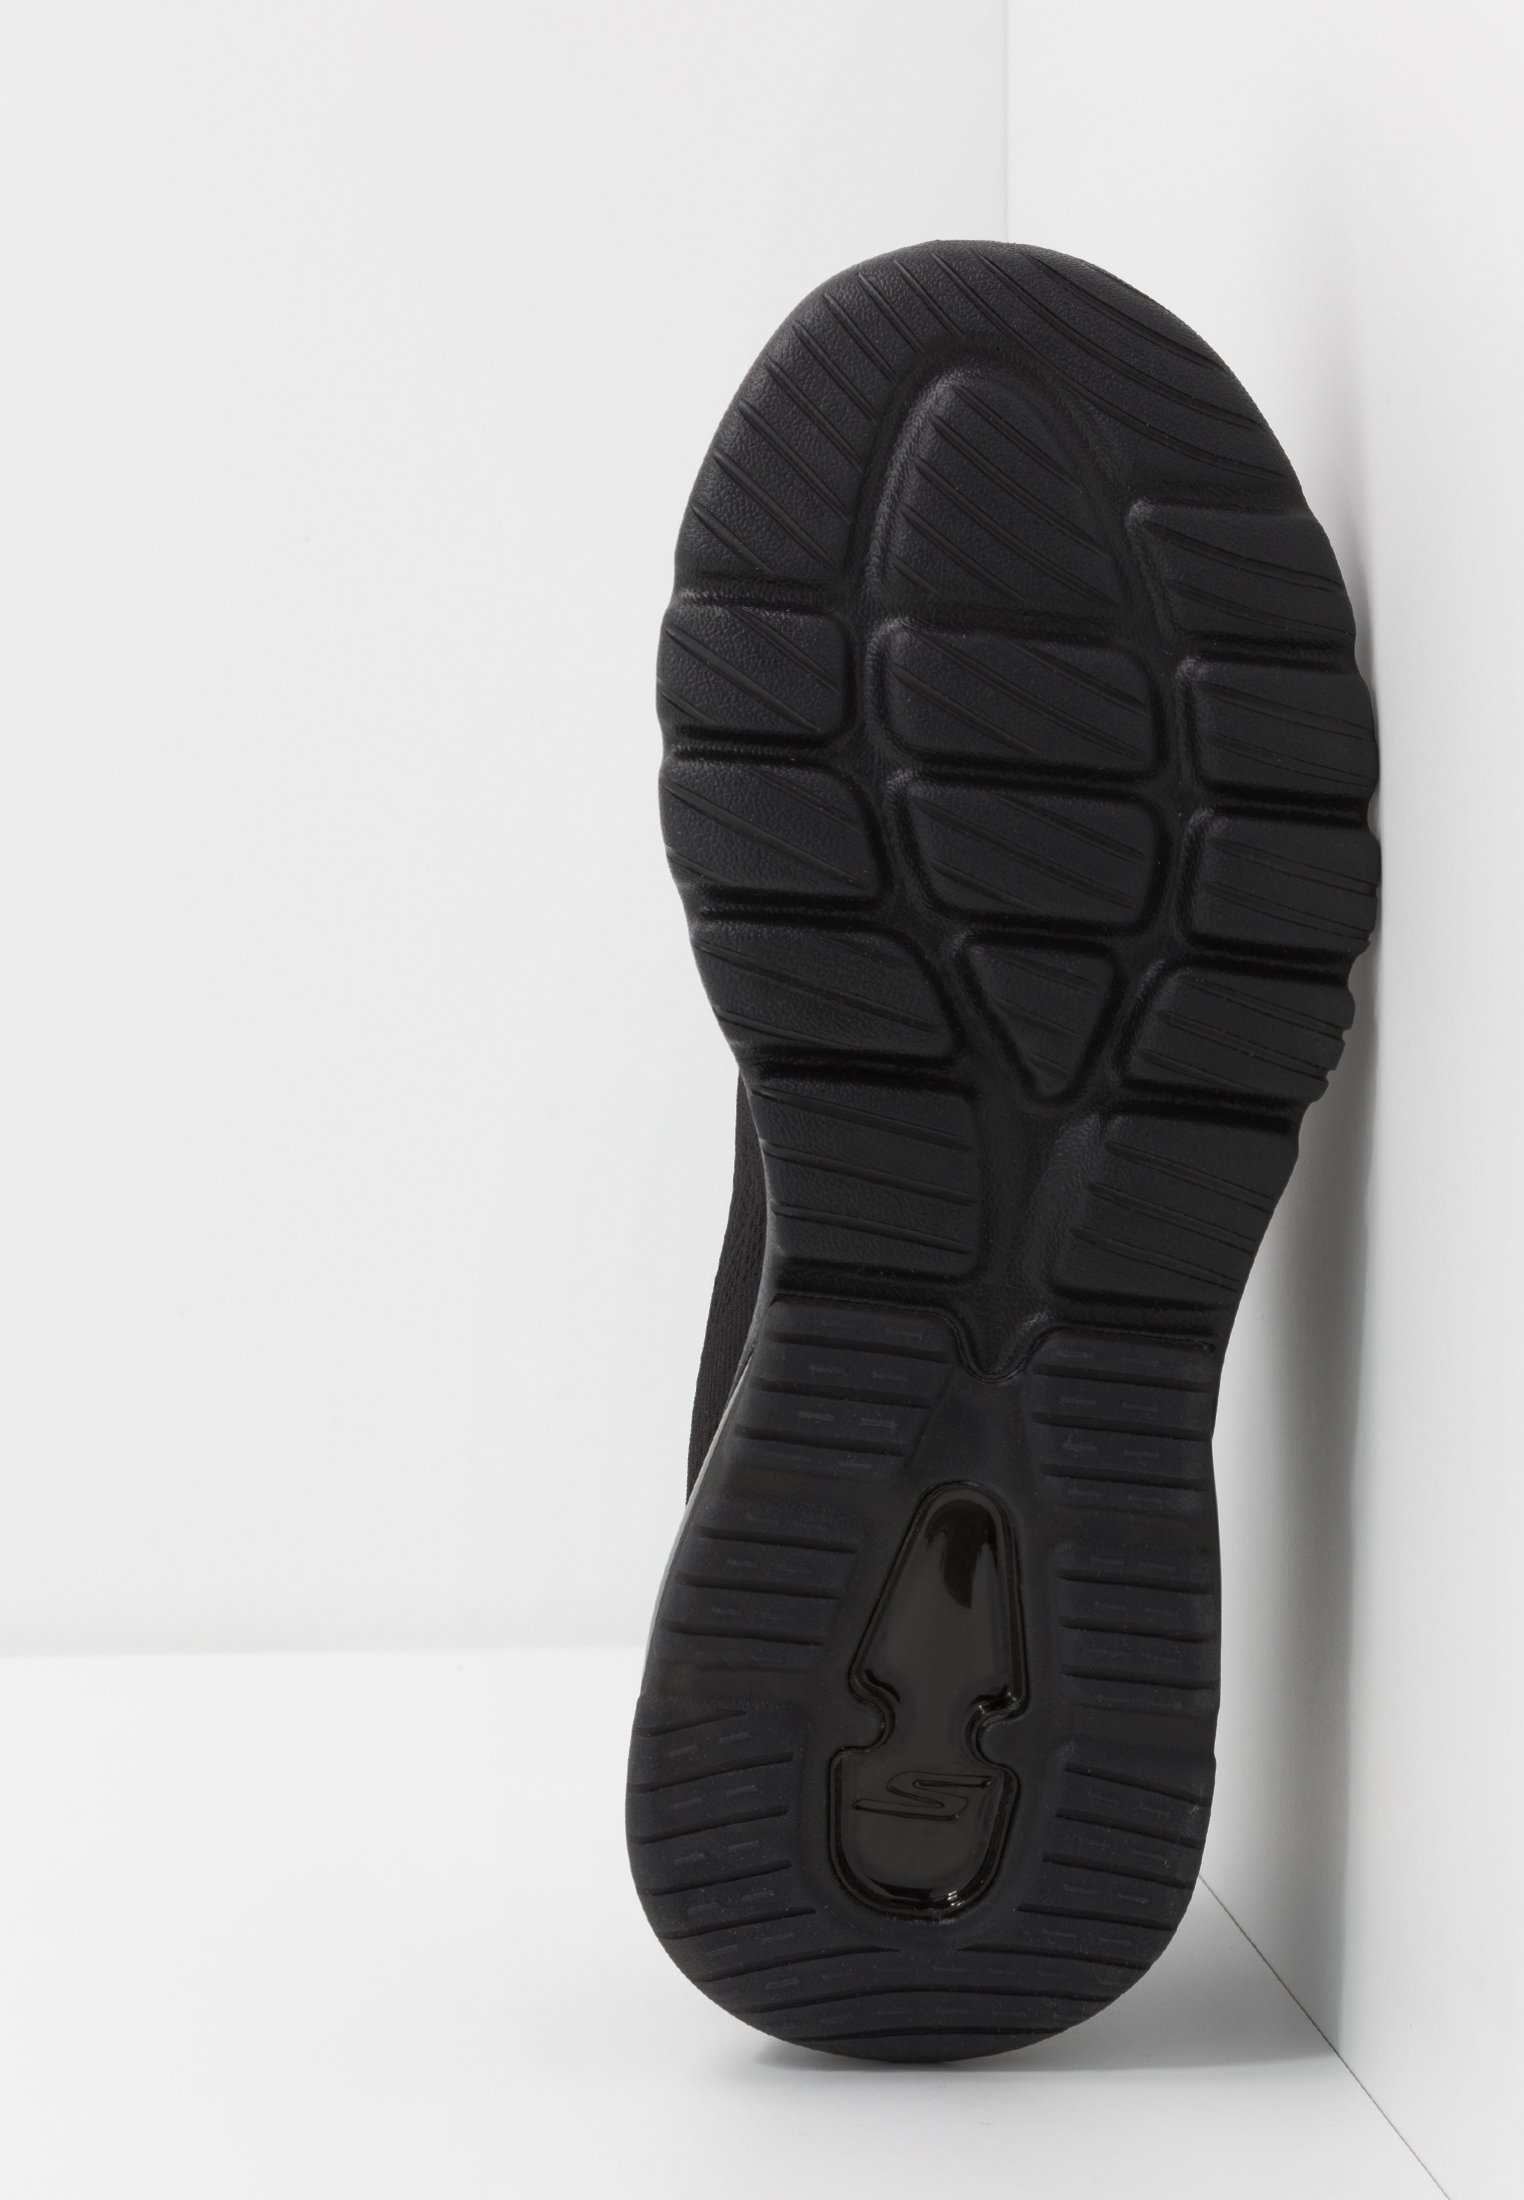 Skechers Performance Go Walk Air - Neutrala Löparskor Triple Black